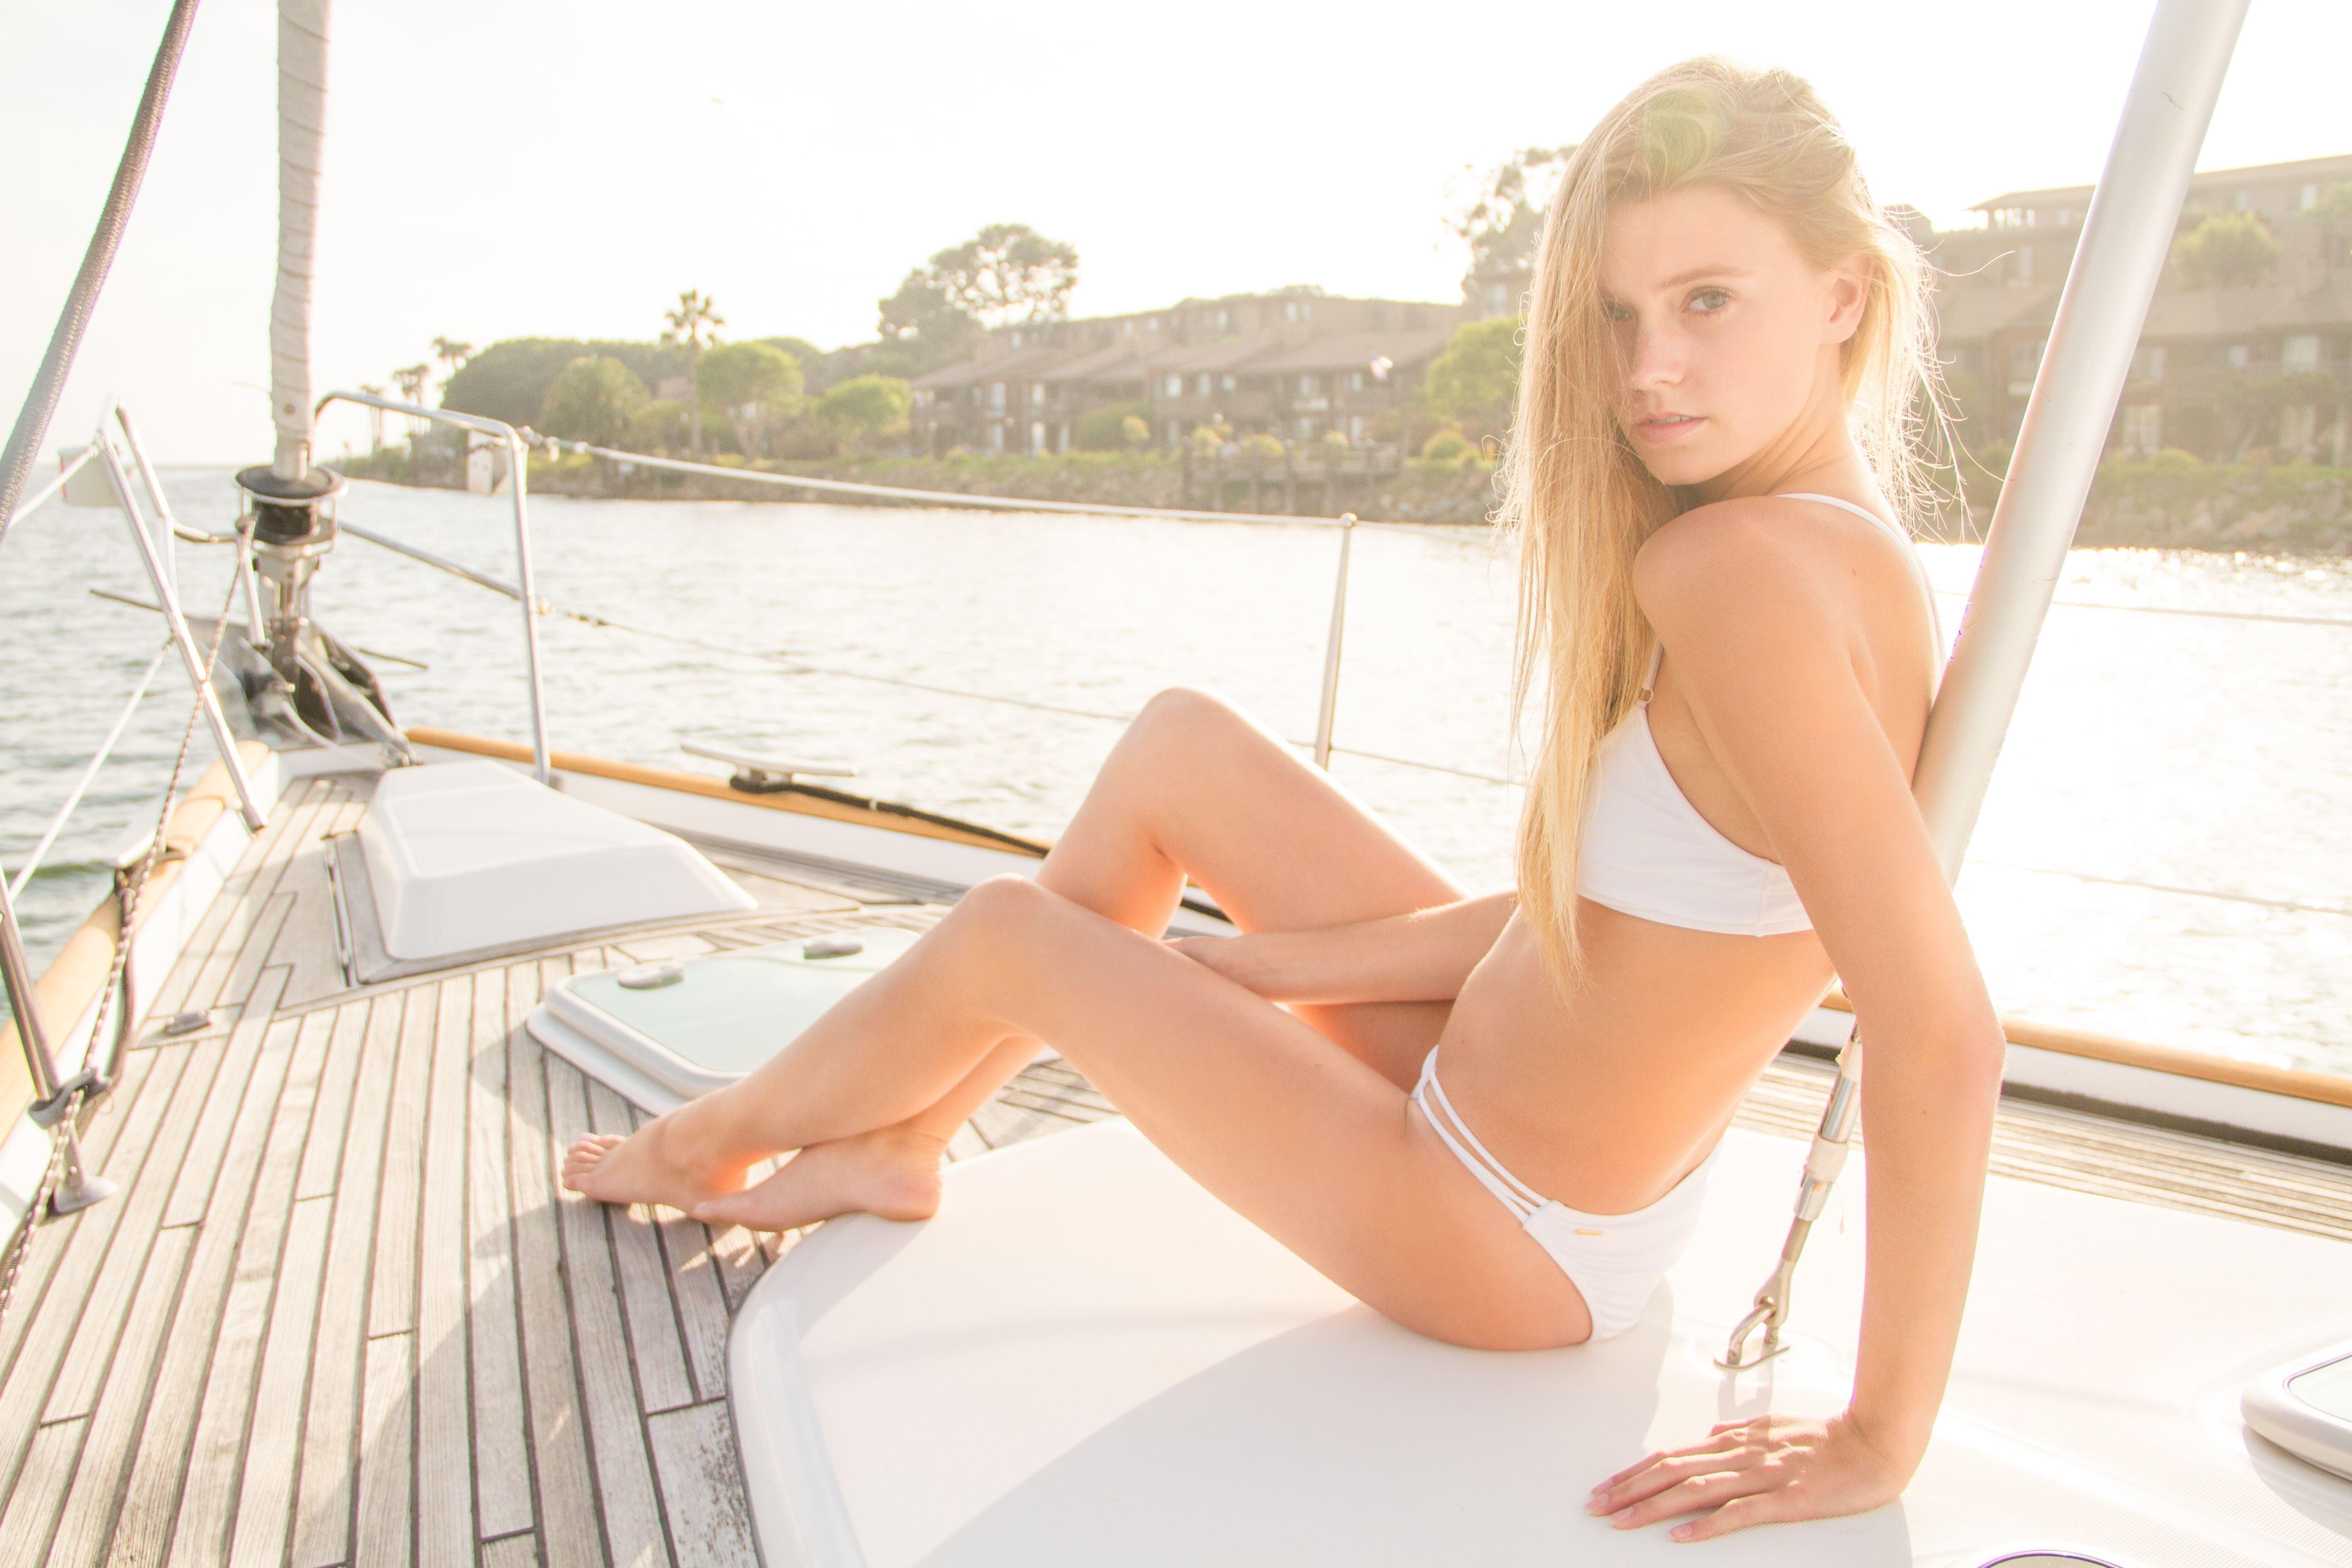 Feet Raina Lawson nudes (89 foto and video), Sexy, Cleavage, Selfie, bra 2020